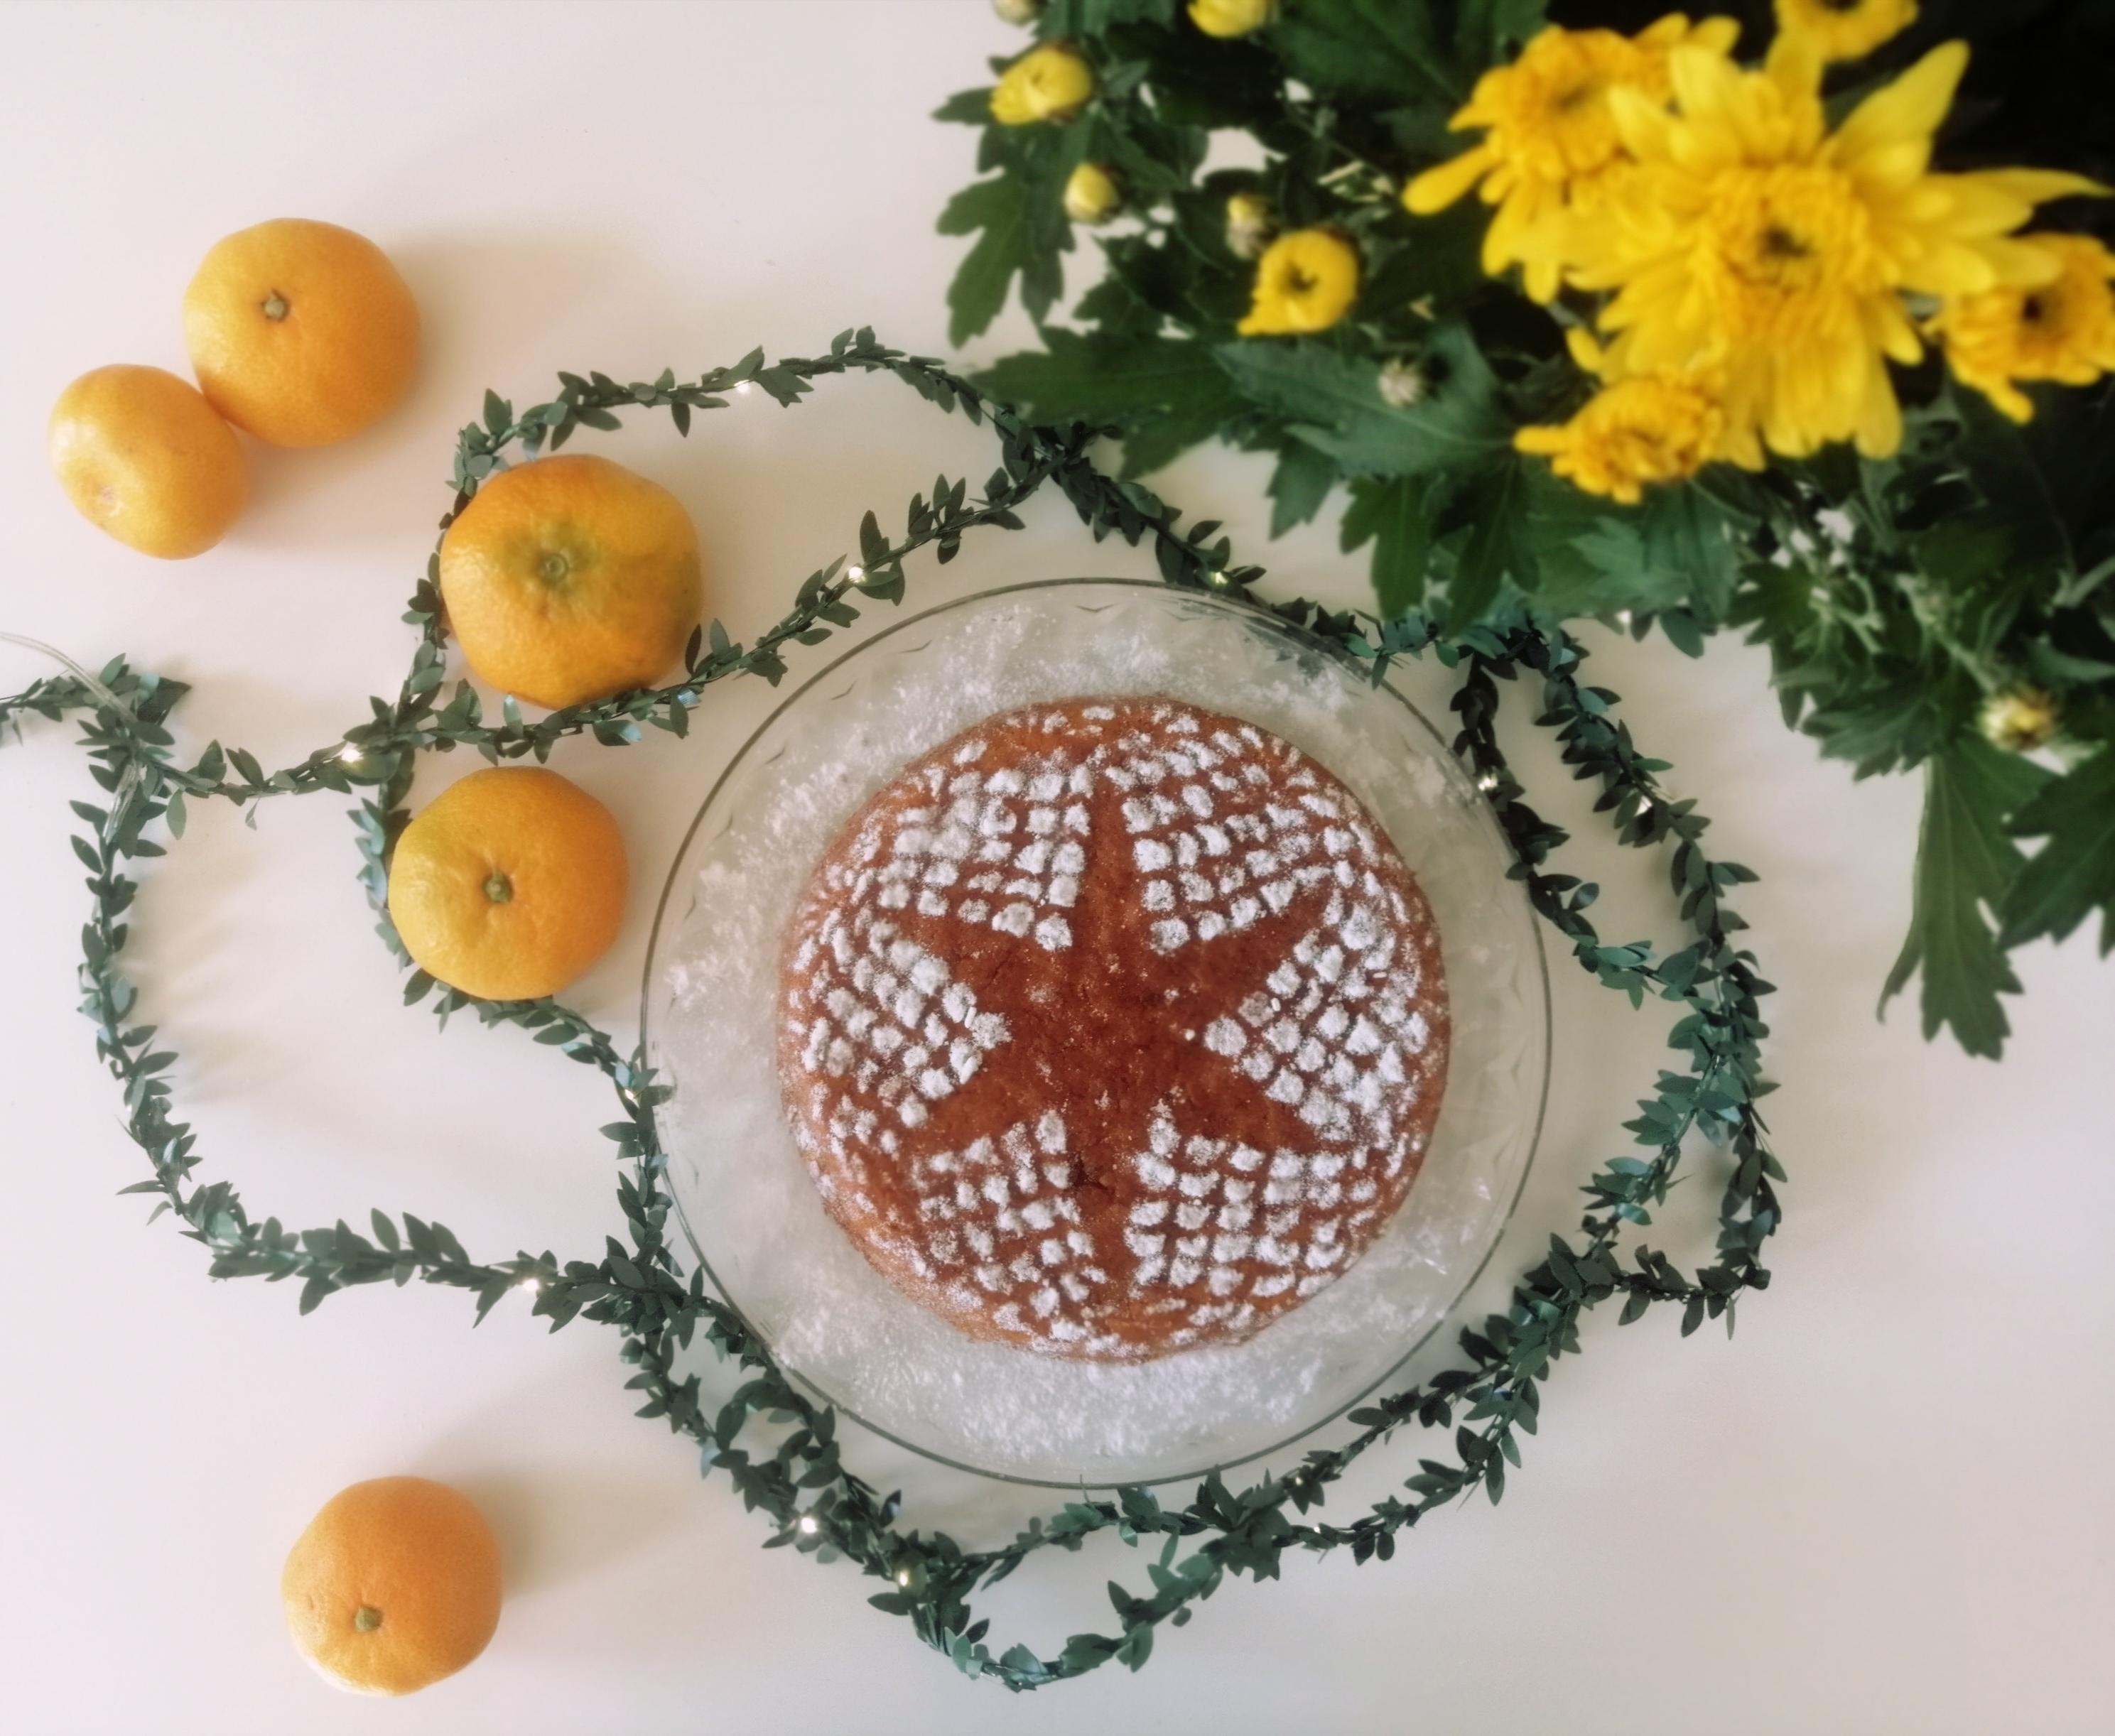 Torta od mrkve i mandarine Izy pizy